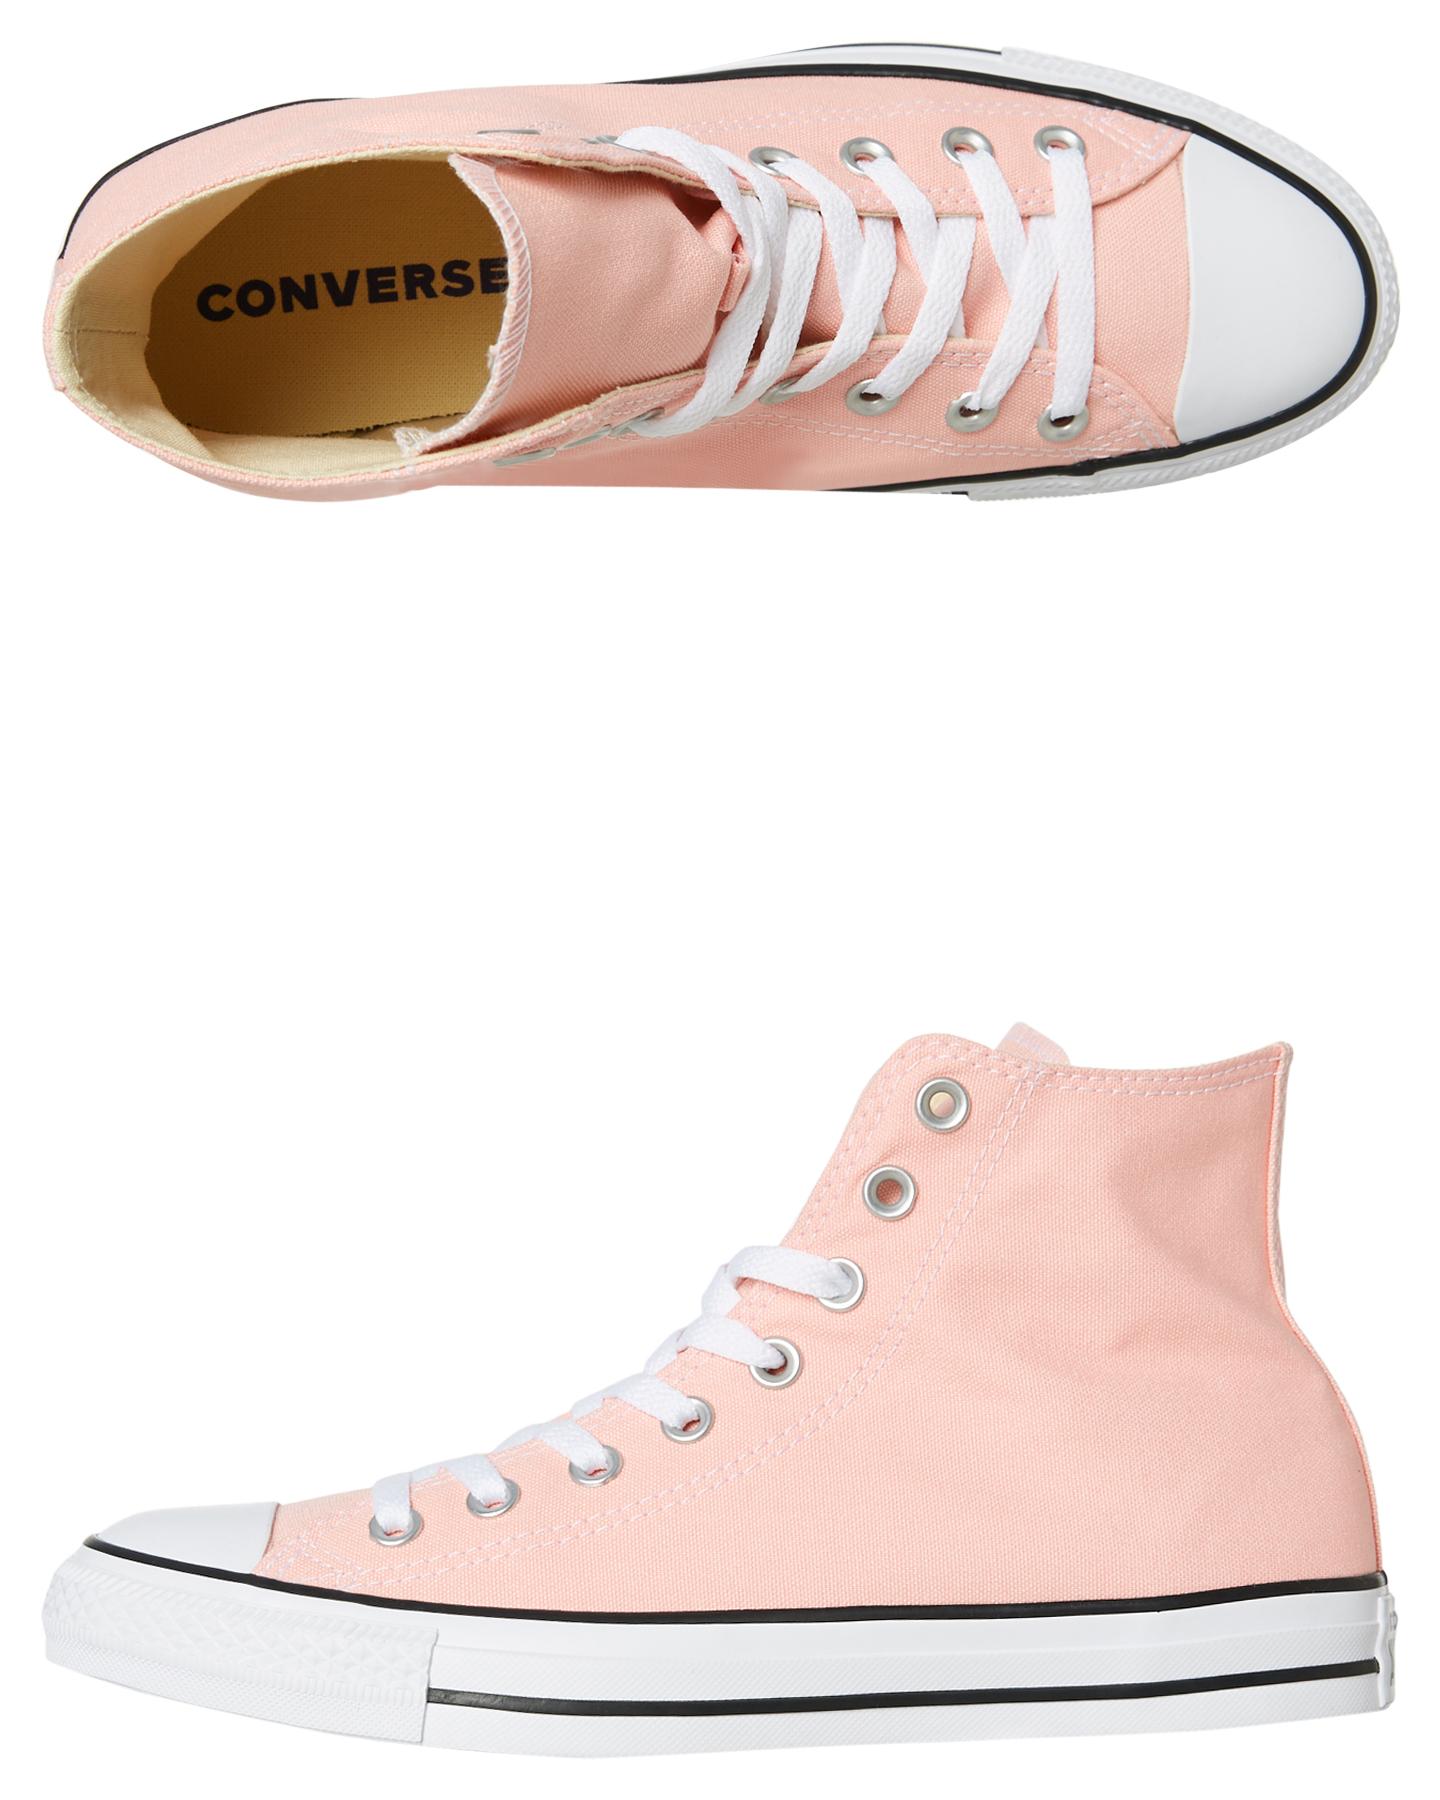 Converse Mens Chuck Taylor All Star Hi Shoe - Pink  4b5eb2d26